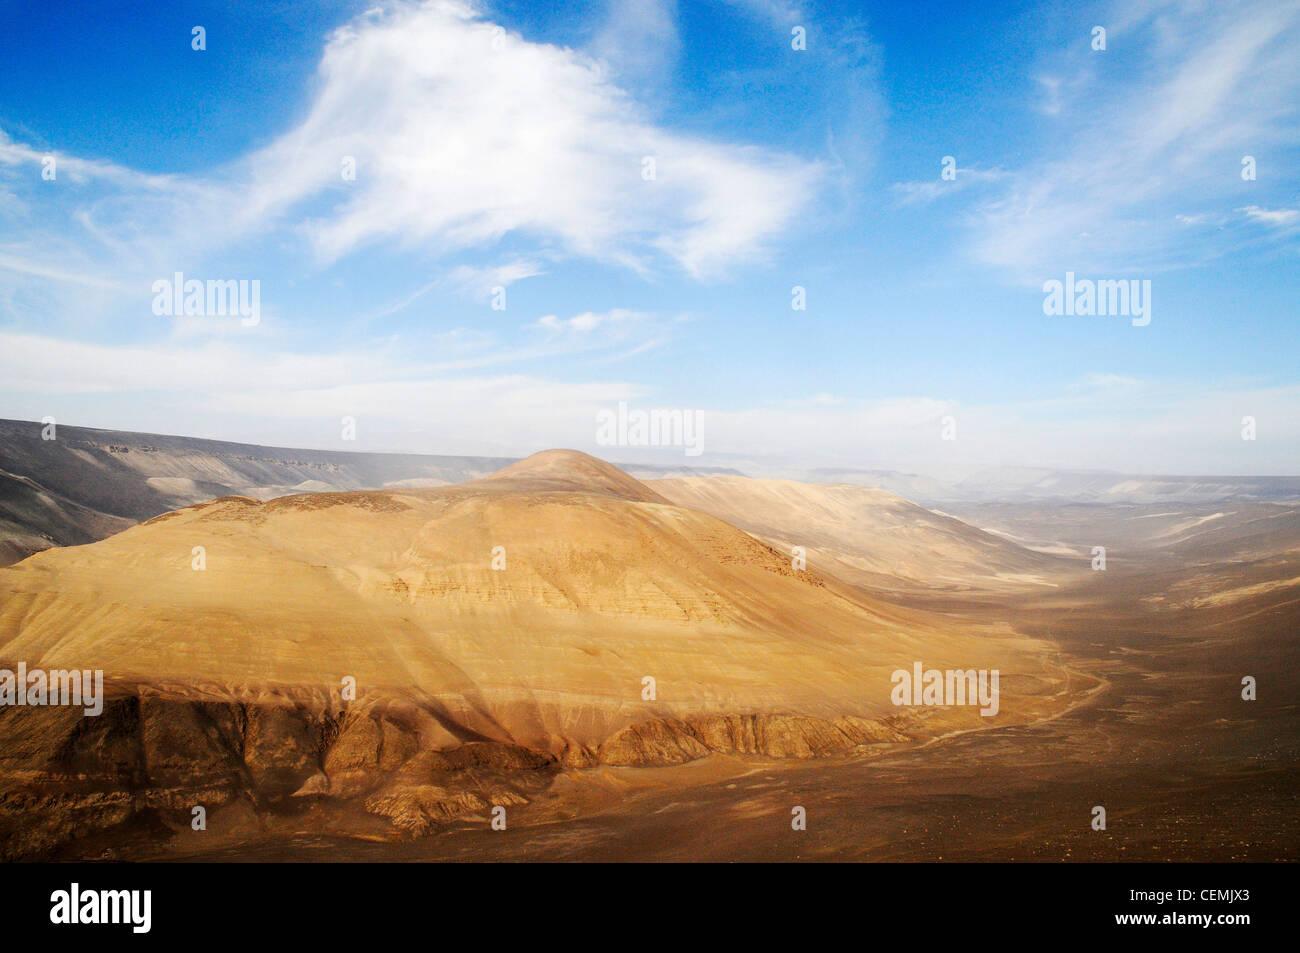 Atacama desert - Stock Image